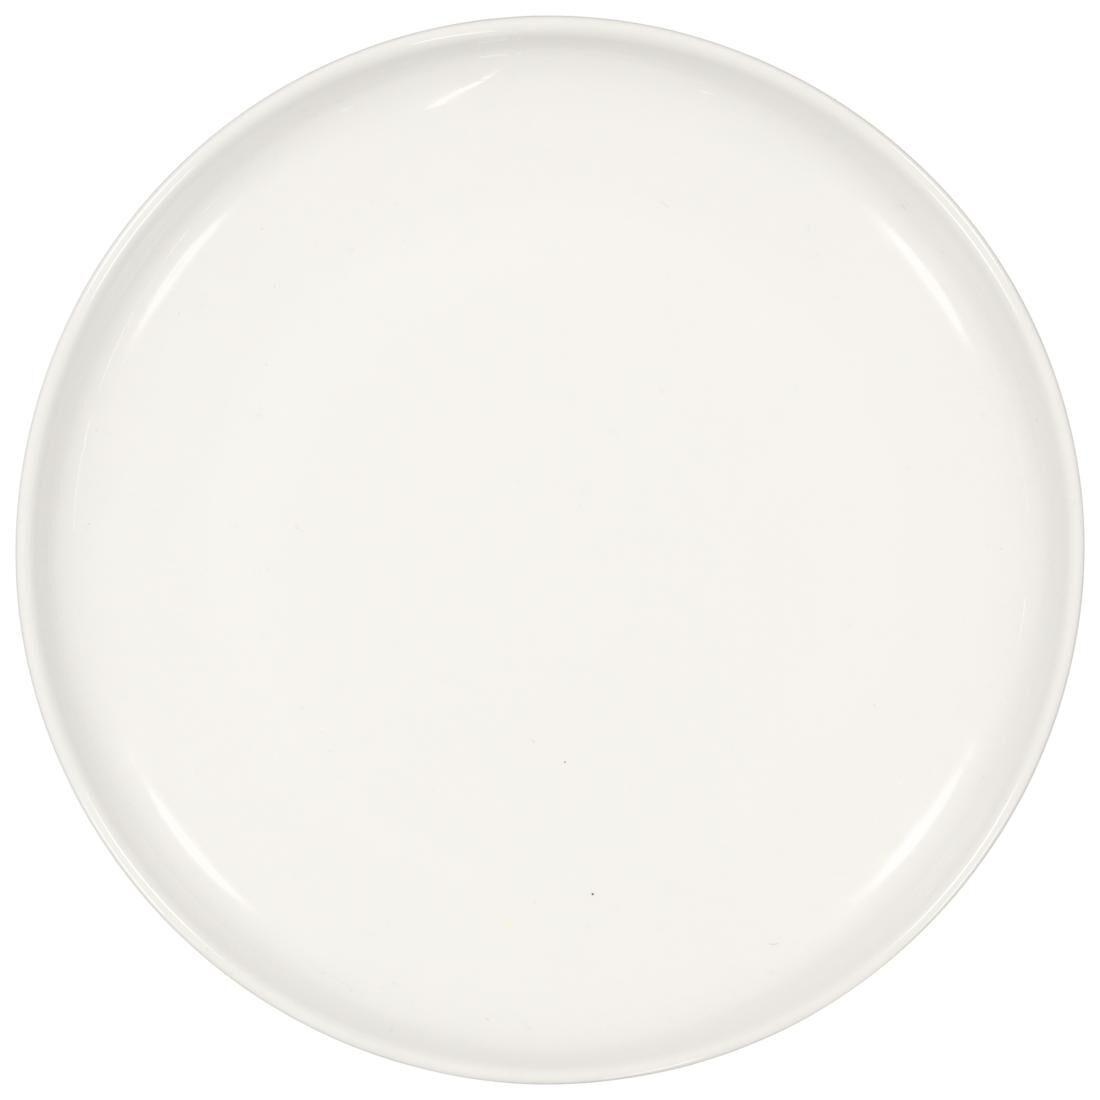 HEMA Dinerbord - 26 Cm - Rome - New Bone - Wit (wit)